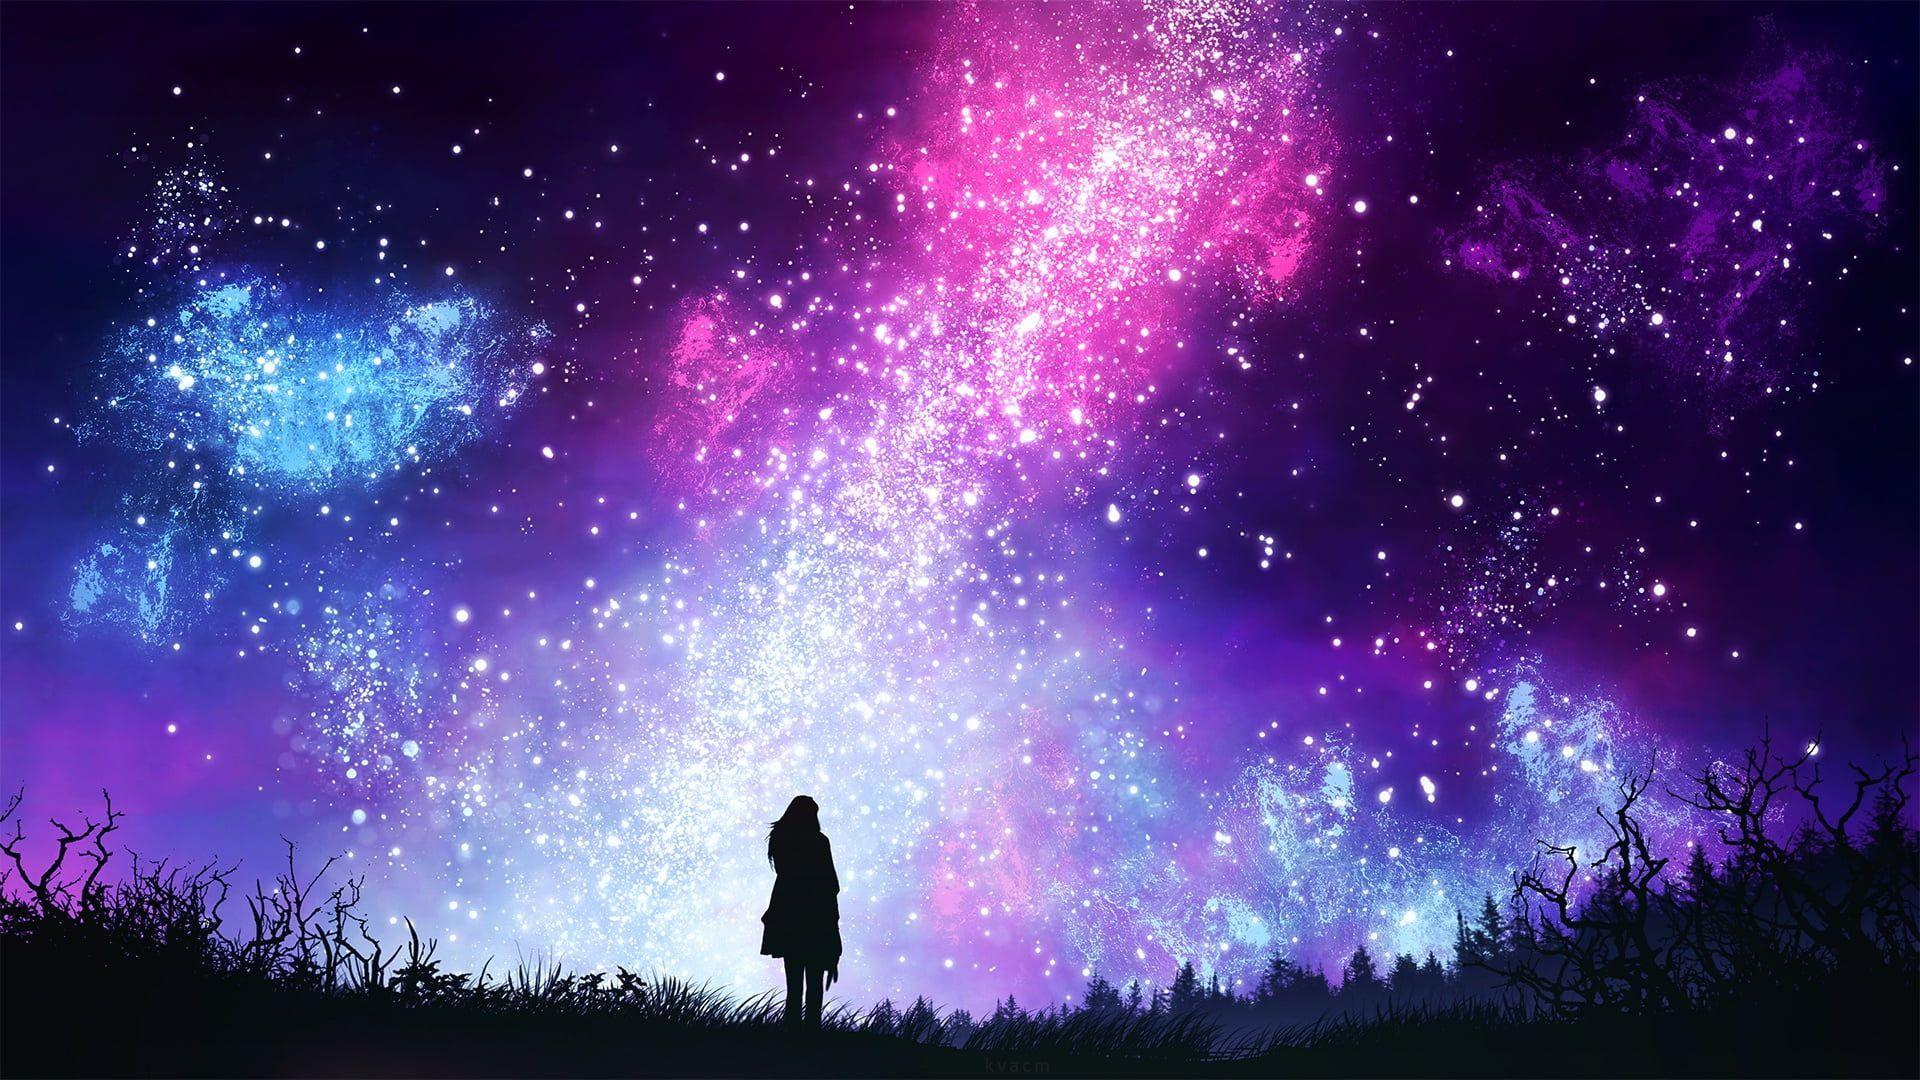 Pink Purple And Blue Galaxy Stars The Sky Girl Space Night By Kvacm 1080p Wallpaper 1080p Galaxy K Night Sky Wallpaper Galaxy Painting Silhouette Art